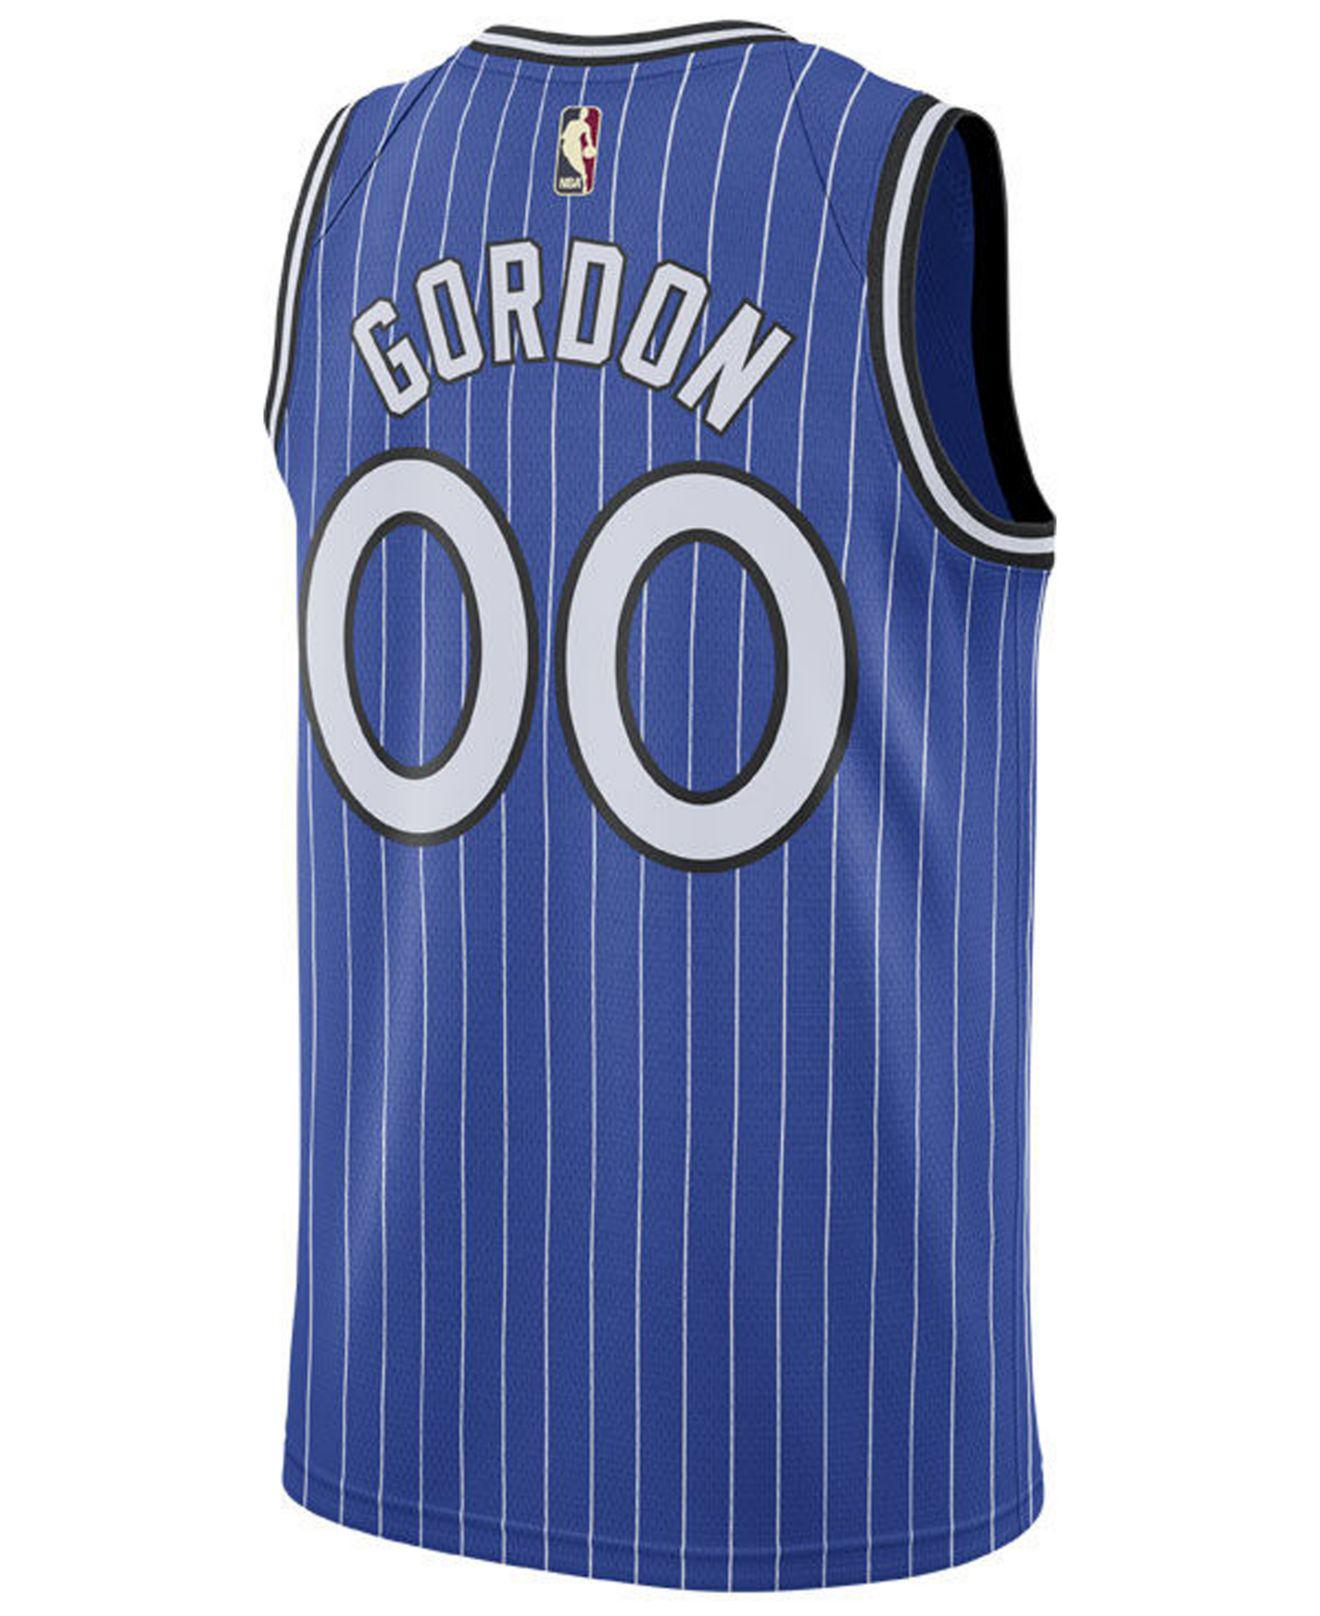 01f1447182d Nike. Men's Blue Aaron Gordon Orlando Magic Hardwood Classic Swingman Jersey